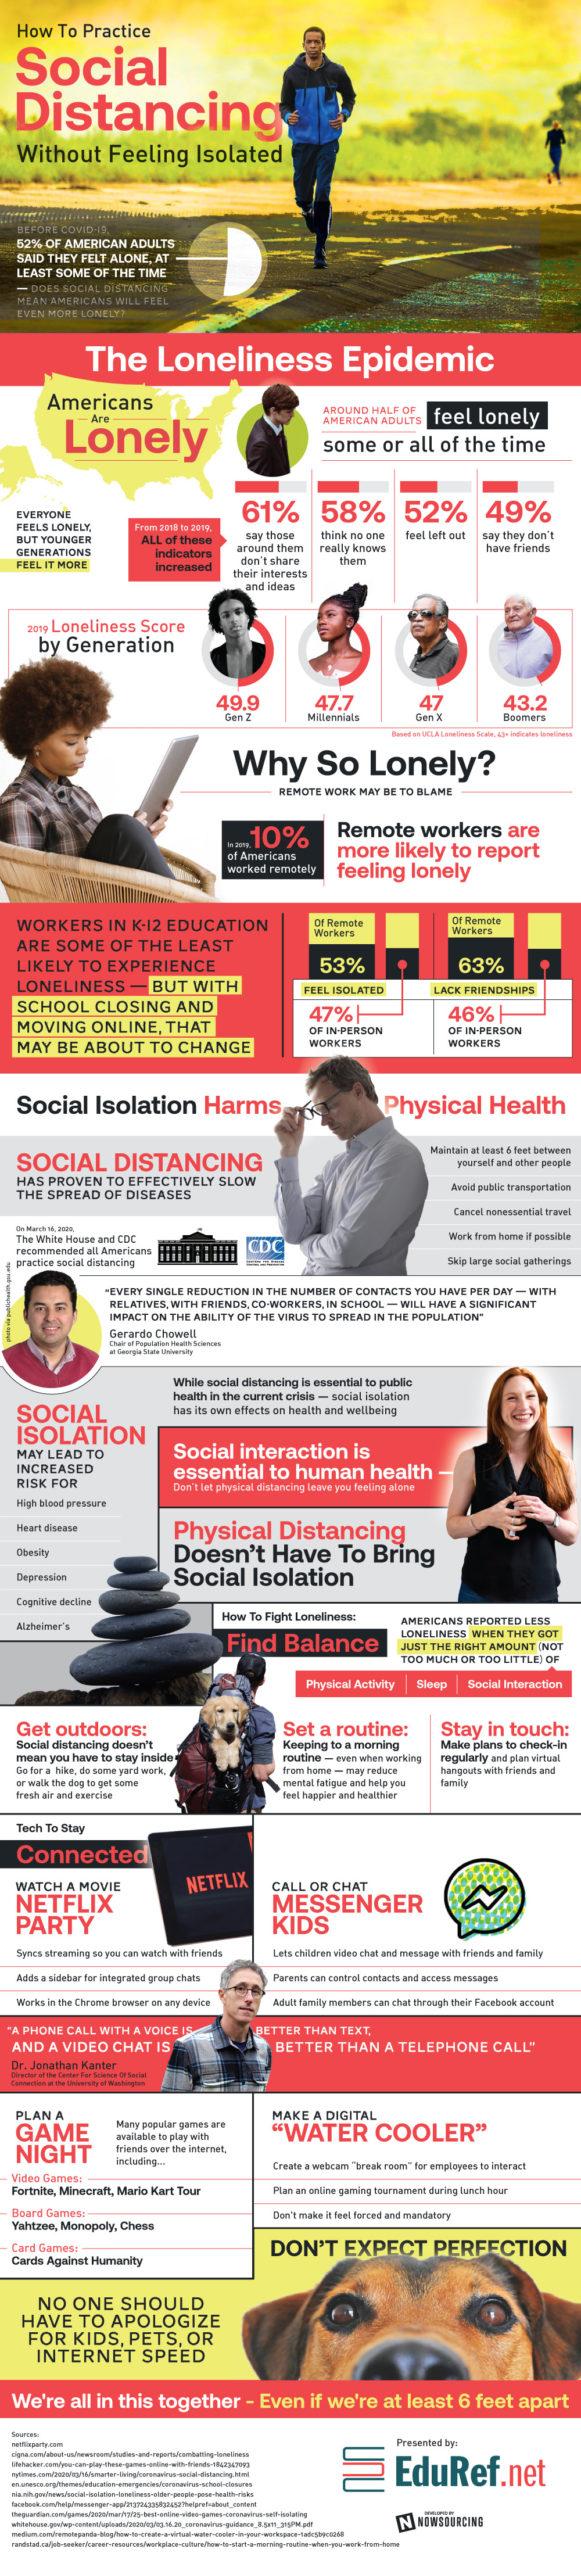 Social Distancing - Not Social Isolation 2